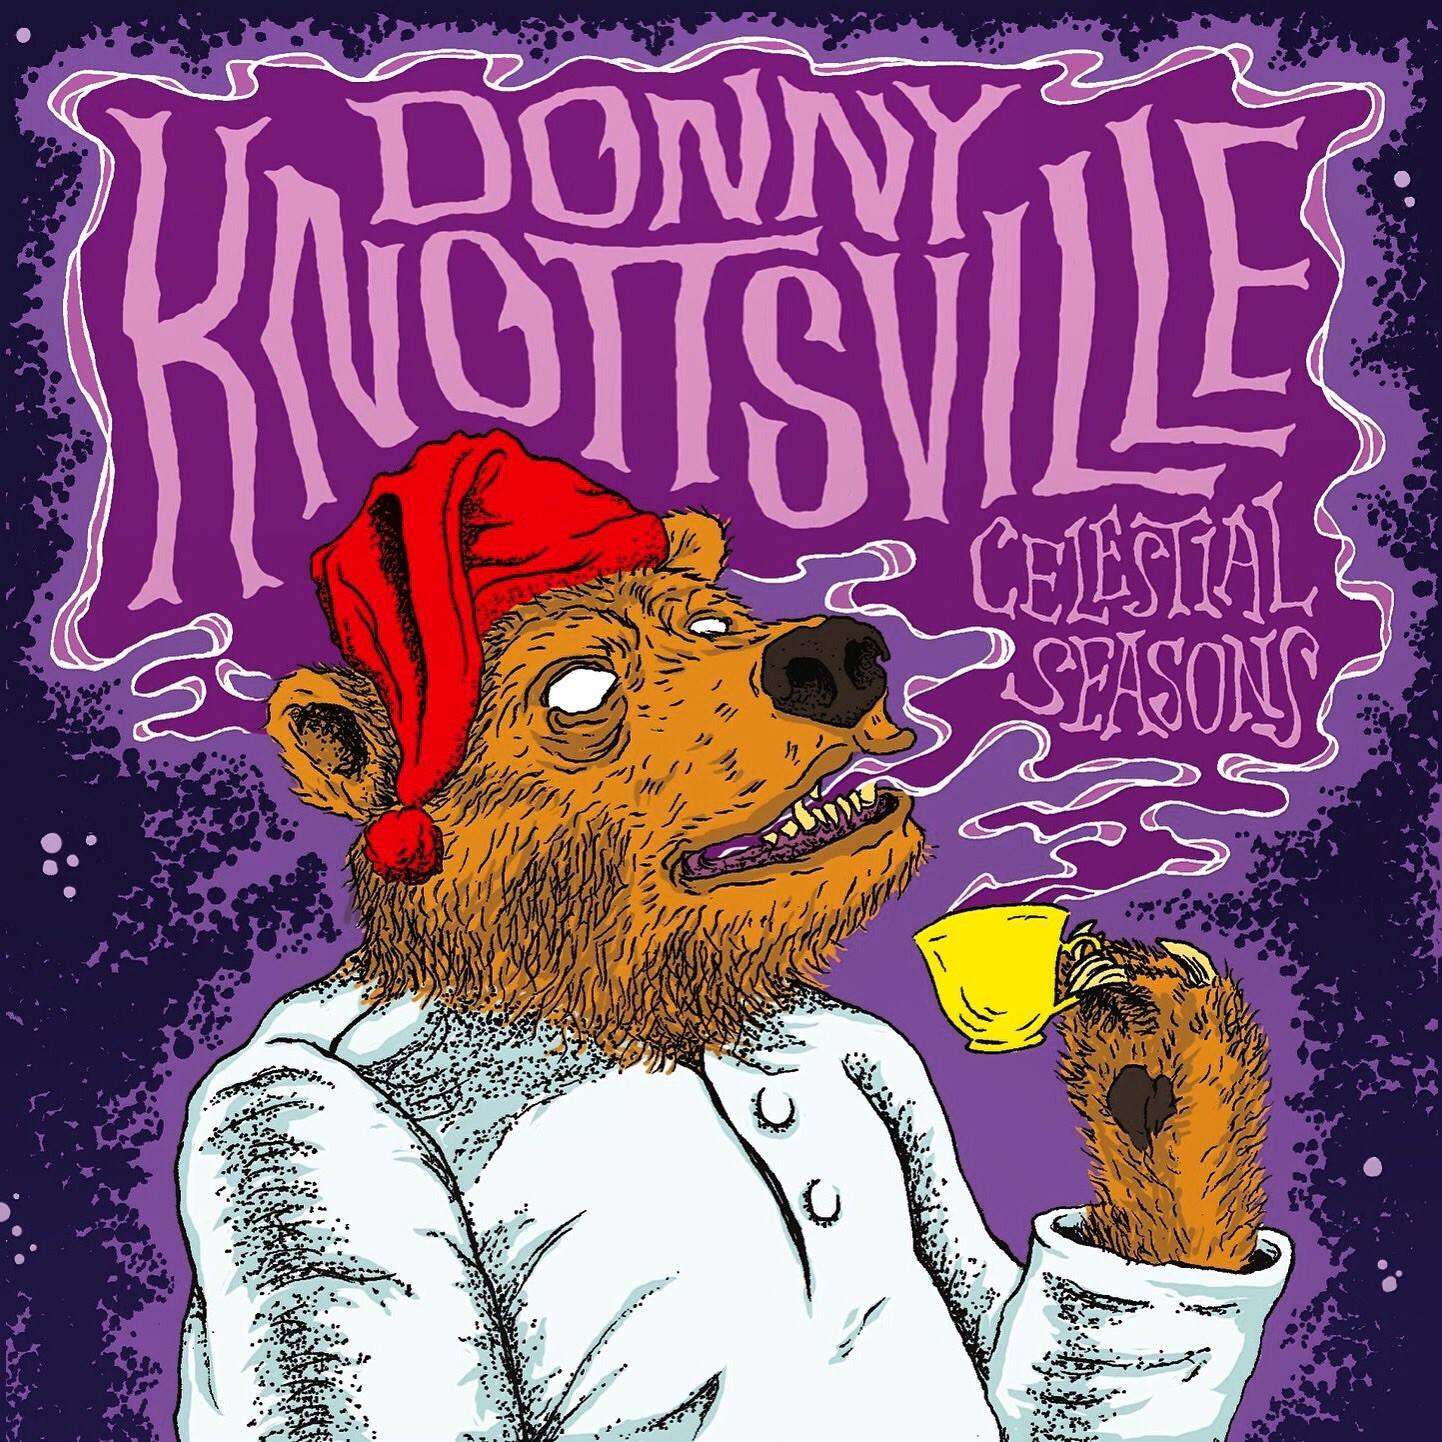 Celestial Seasons - Donny Knottsville